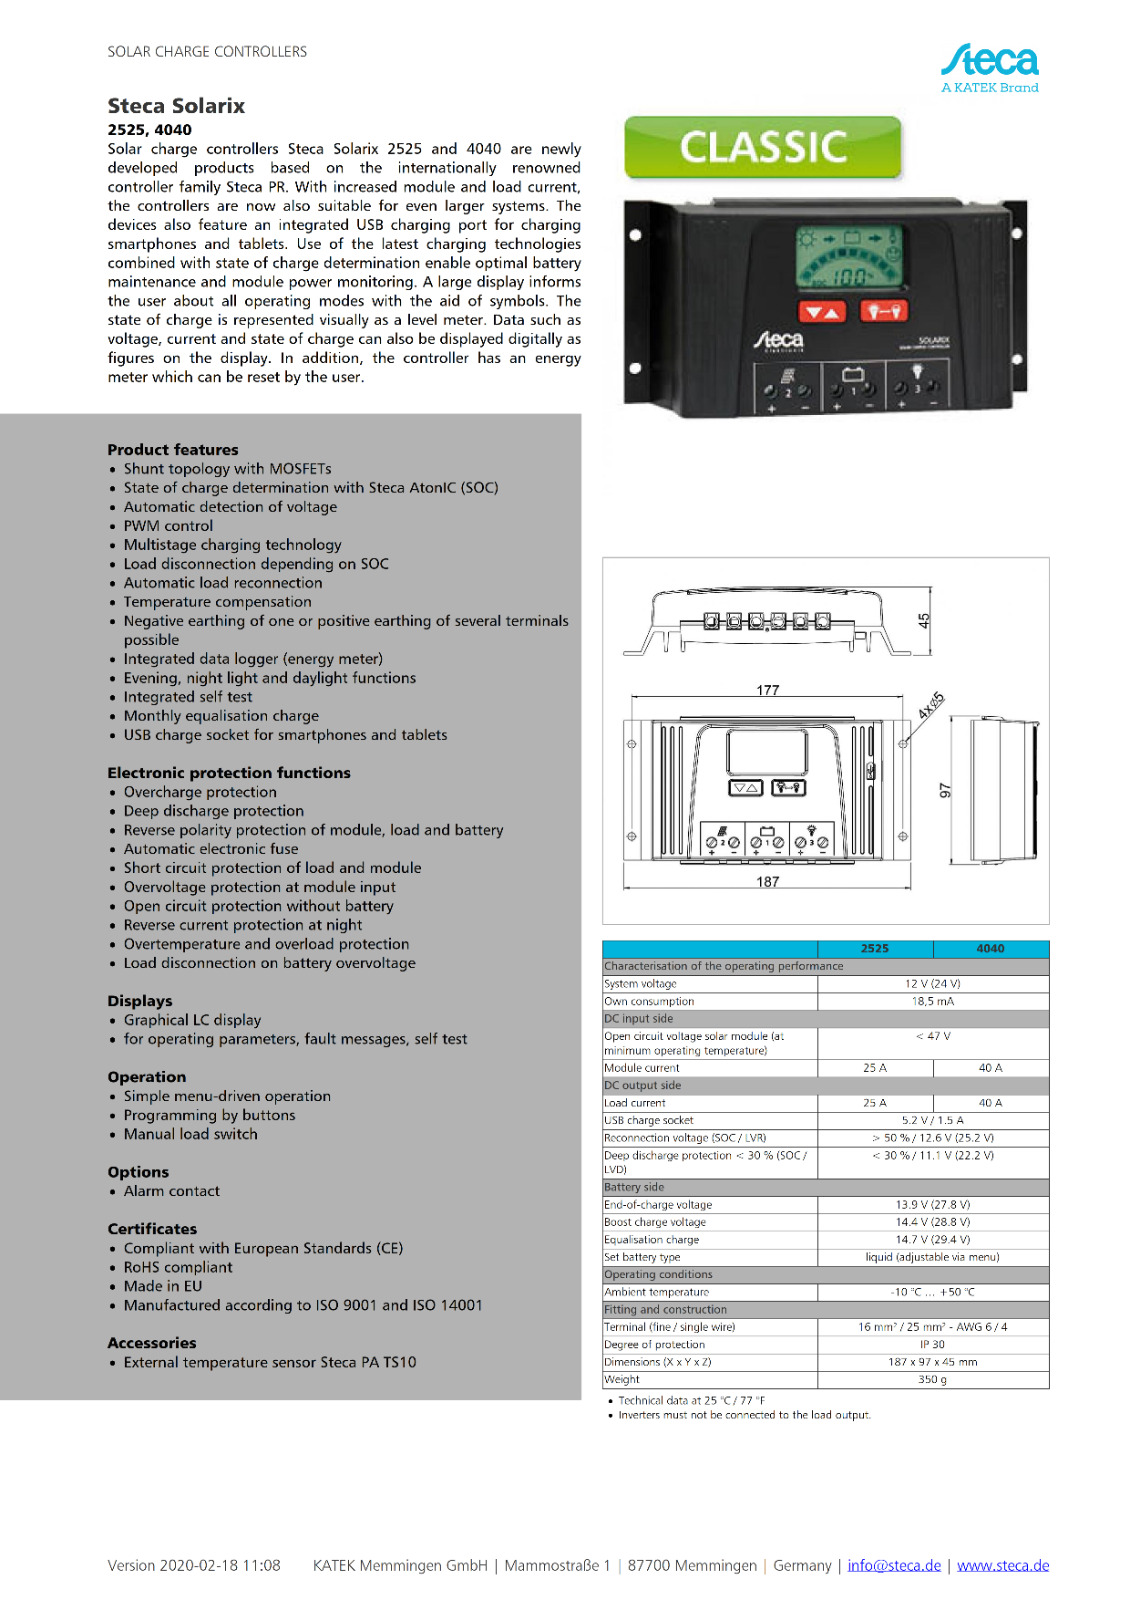 Steca 240 W 12-24 V 8 A Regolatore di carica solare